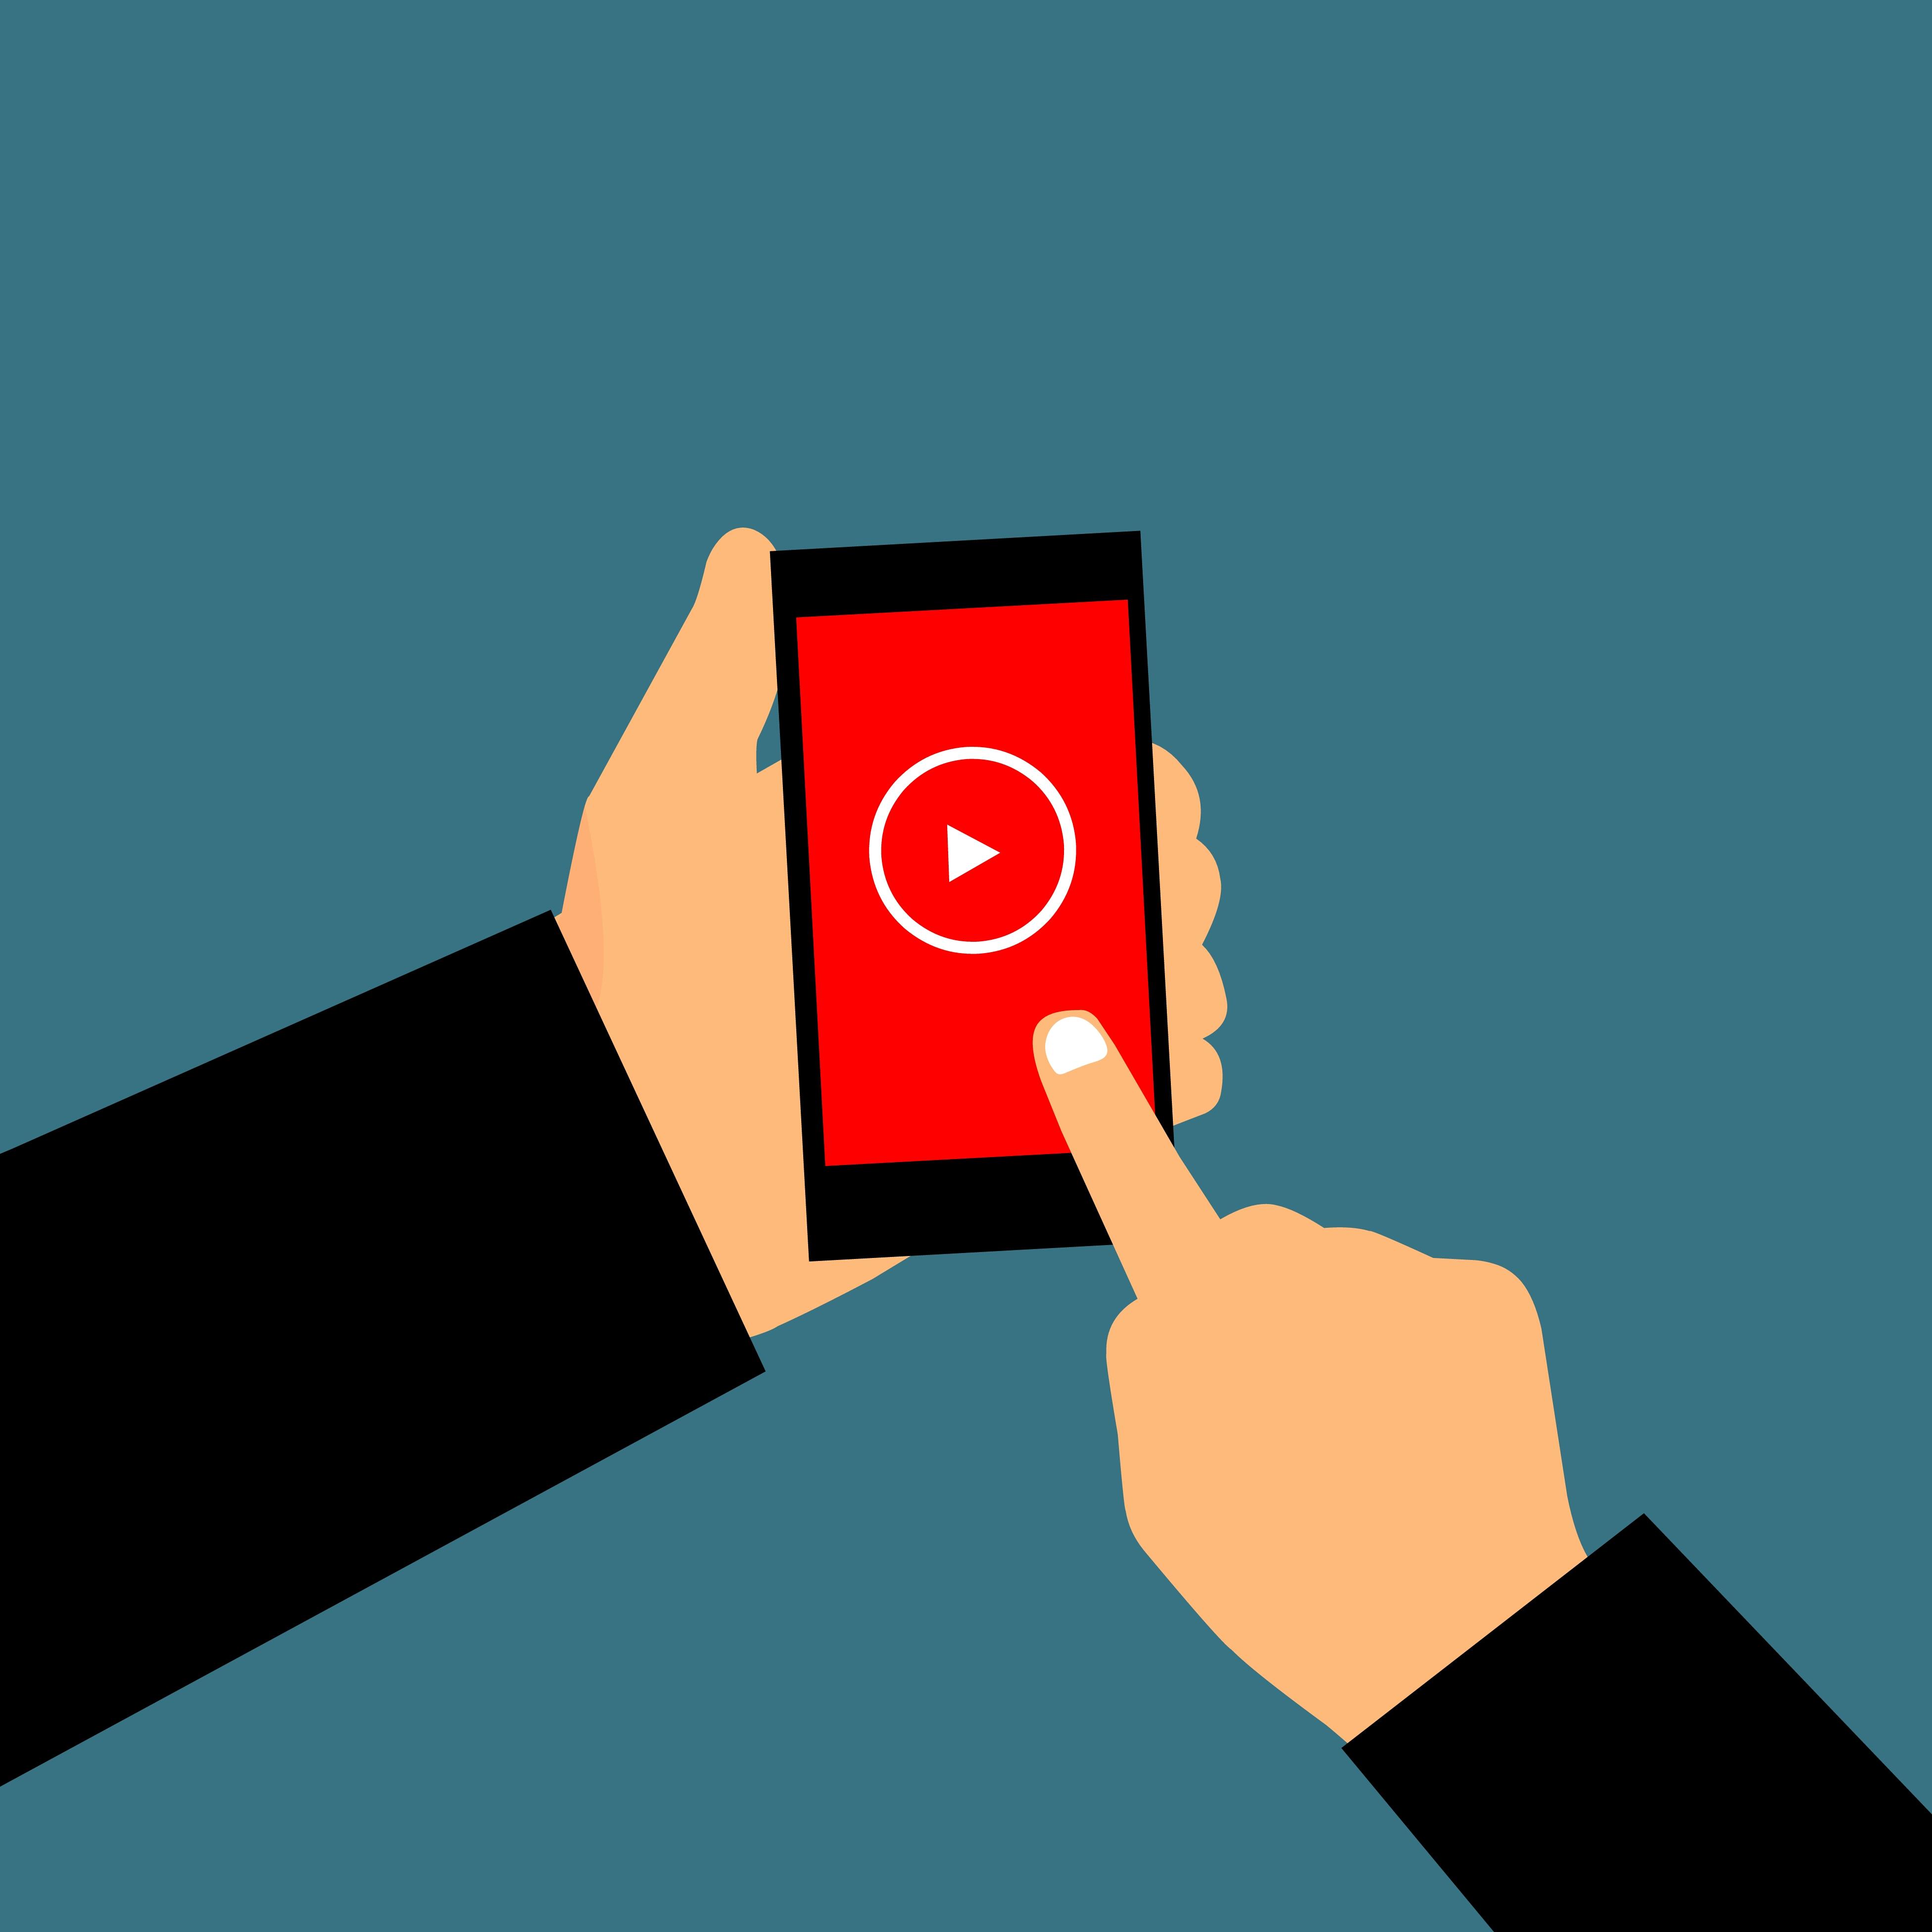 Free Images  Video, Netflix, Online, Media, Player, Youtube, Cloud, Digital, Film, Internet -6189